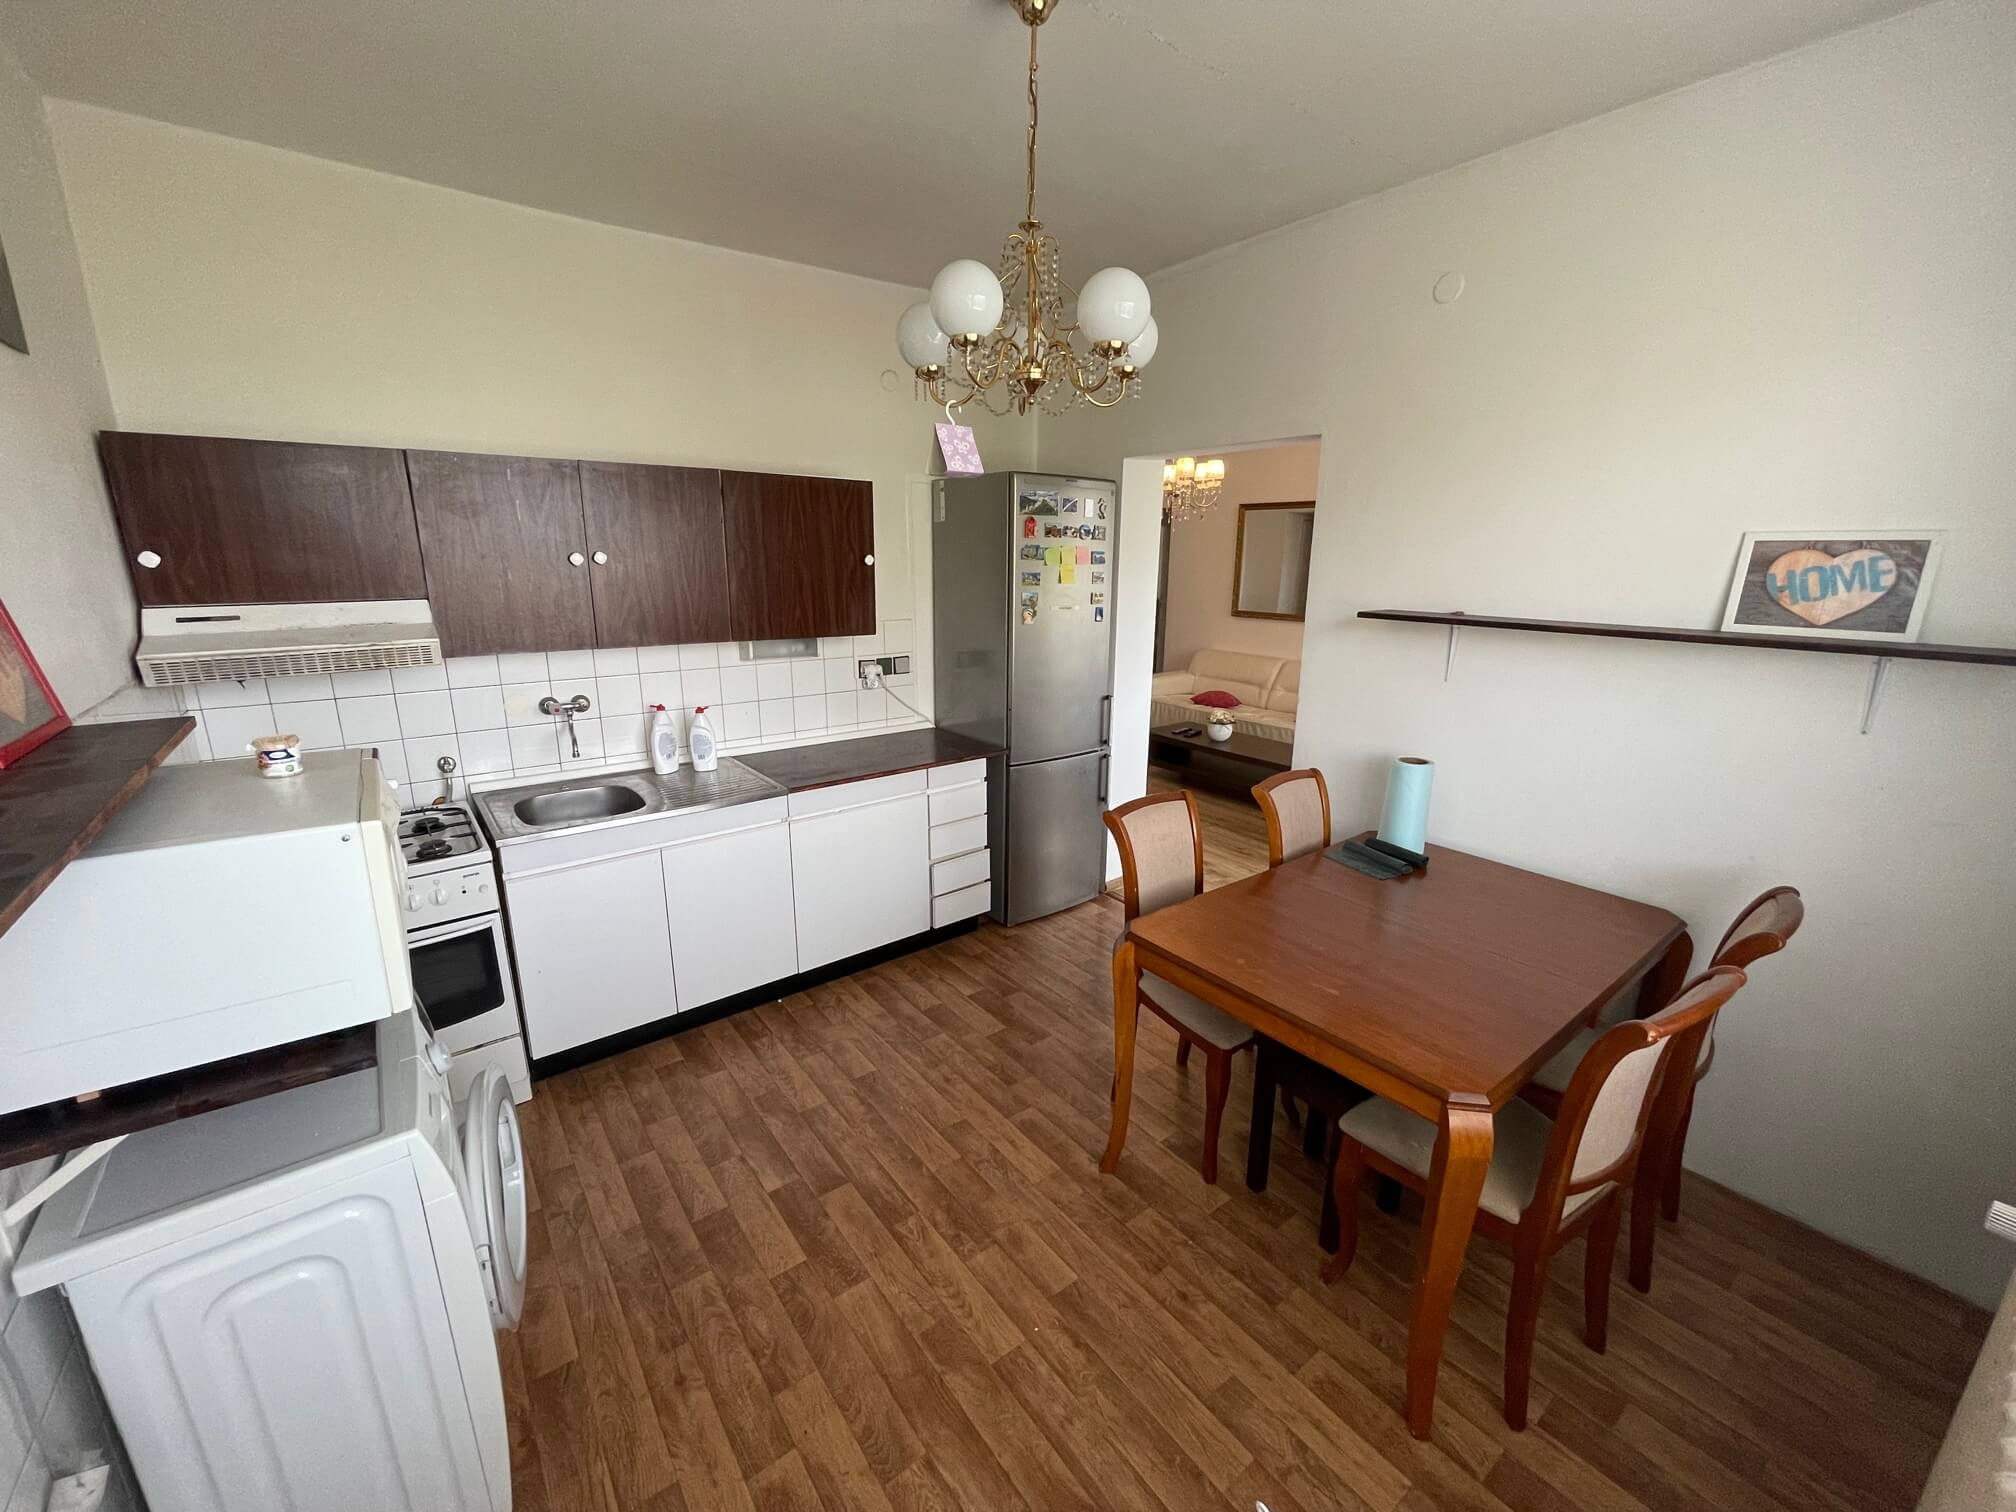 Exkluzívne na prenájom 3 izbový byt, 83m2, 2x loggia 4,5m2, Karolovka, Janotová 8-3